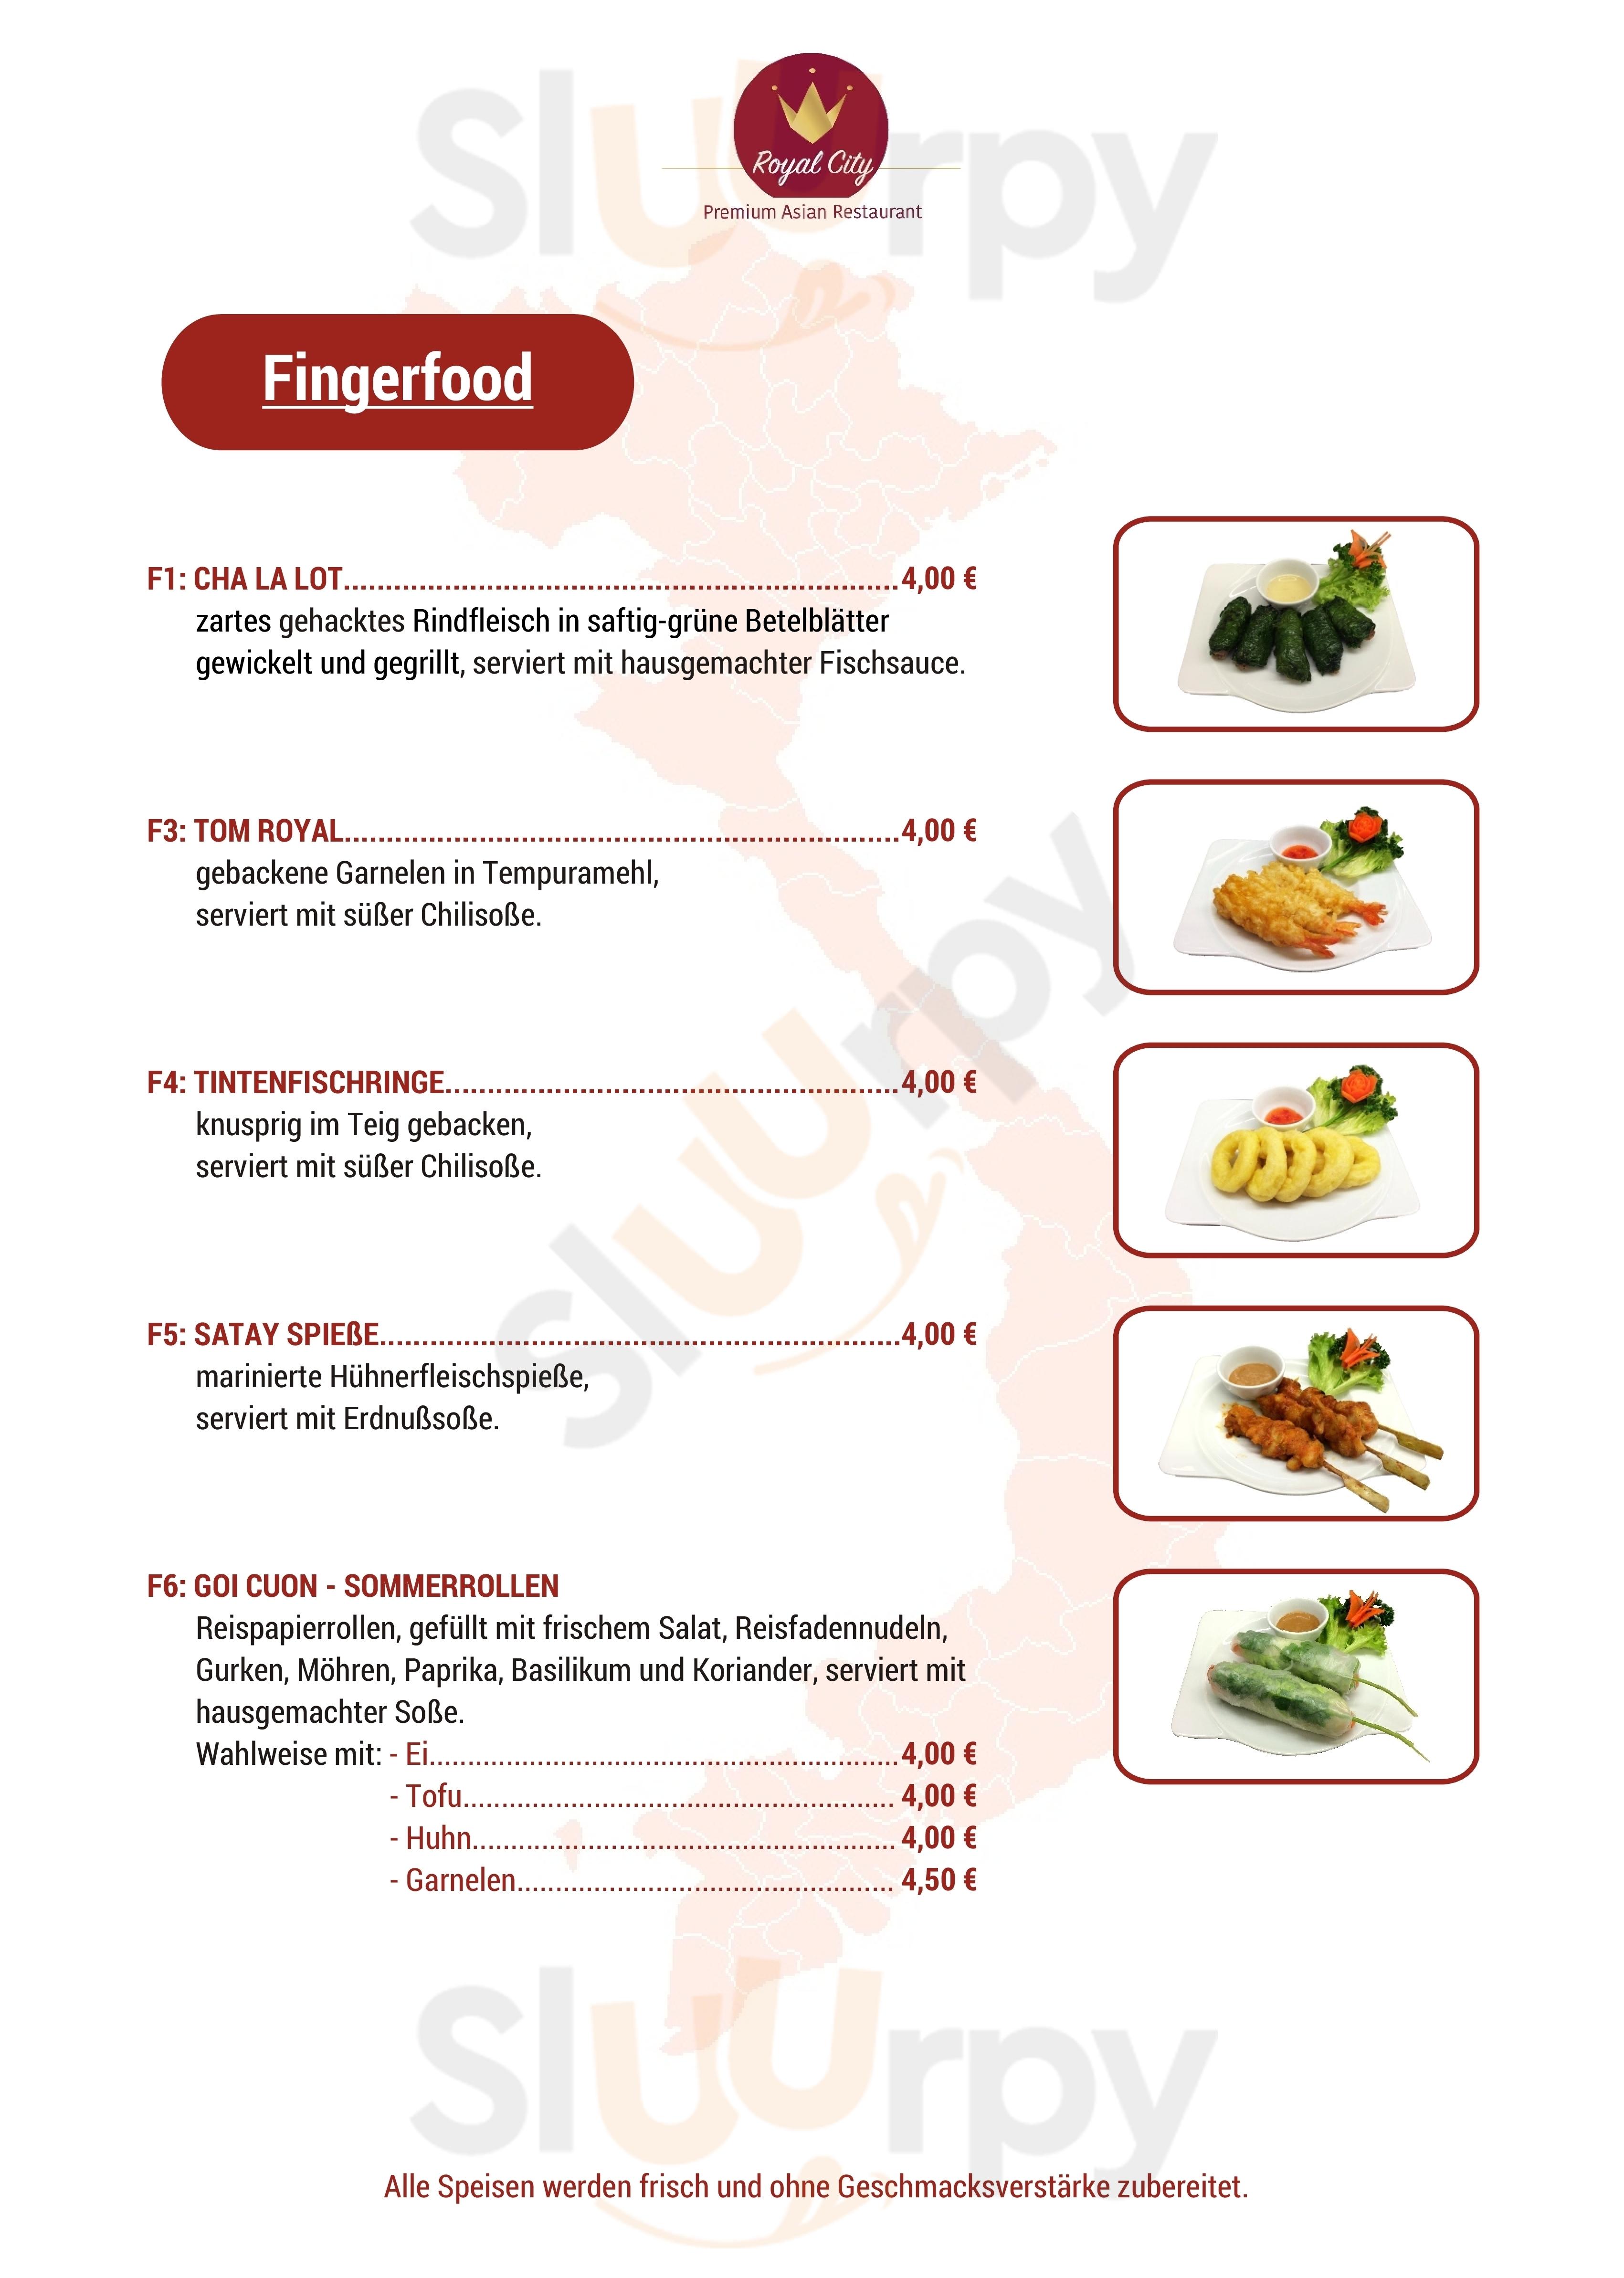 Restaurant Royal City Hannover Menu - 1